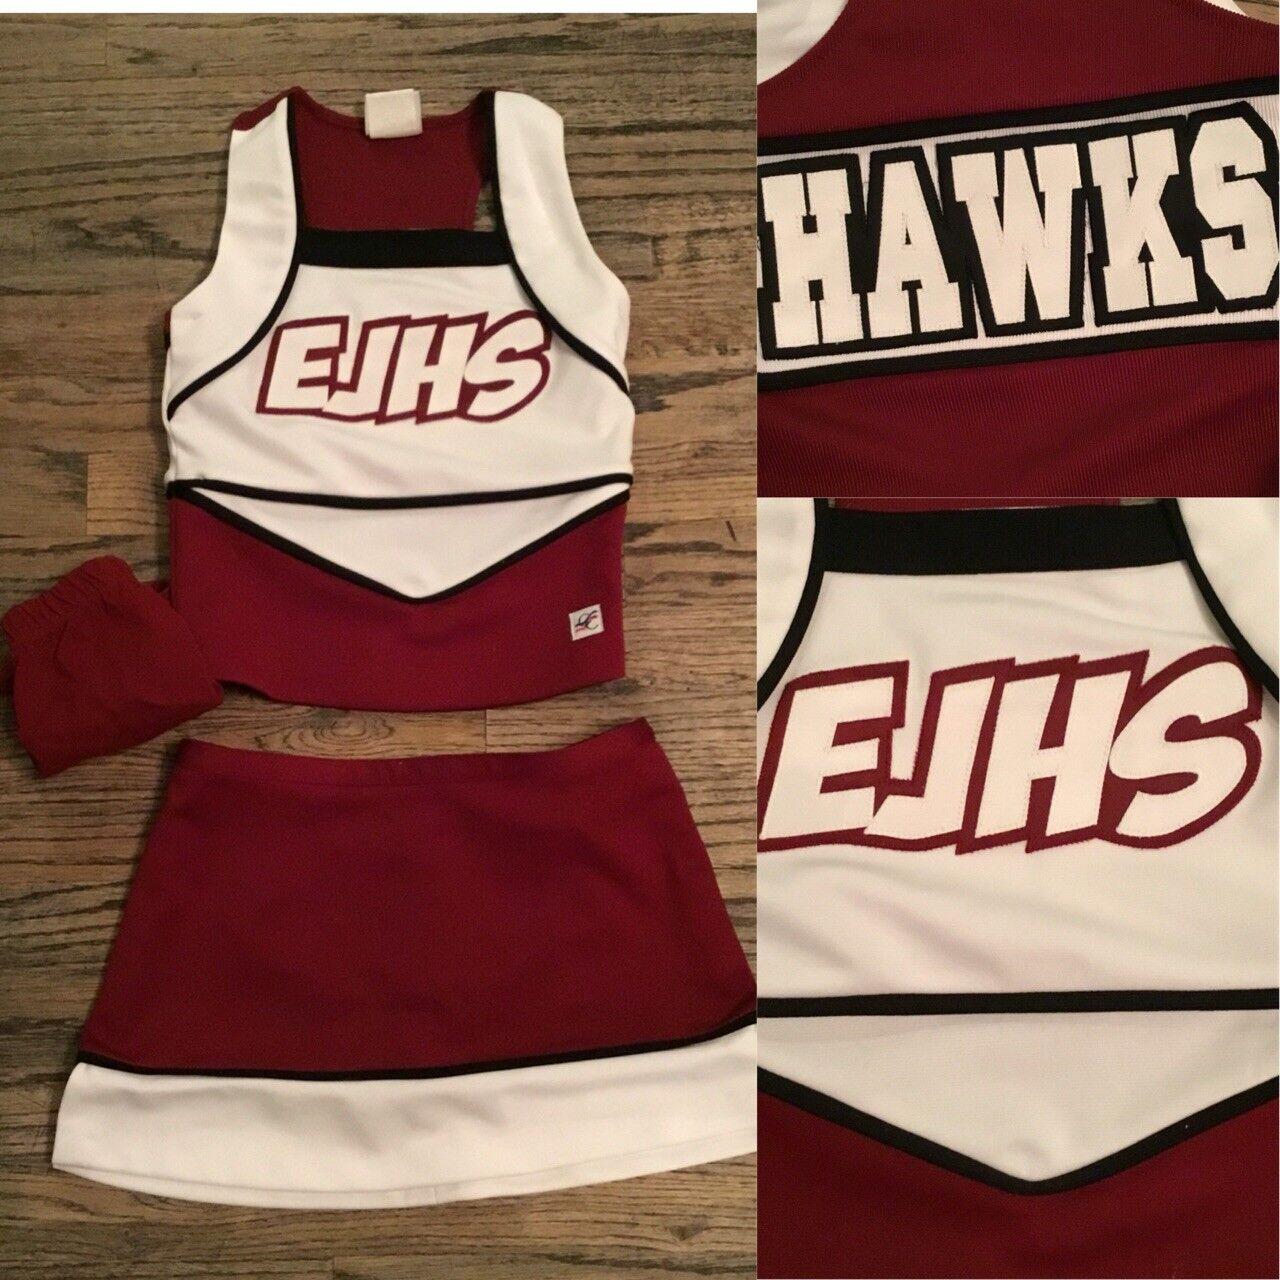 3pc Real Cheerleading Uniform HS  Sz2  for sale online